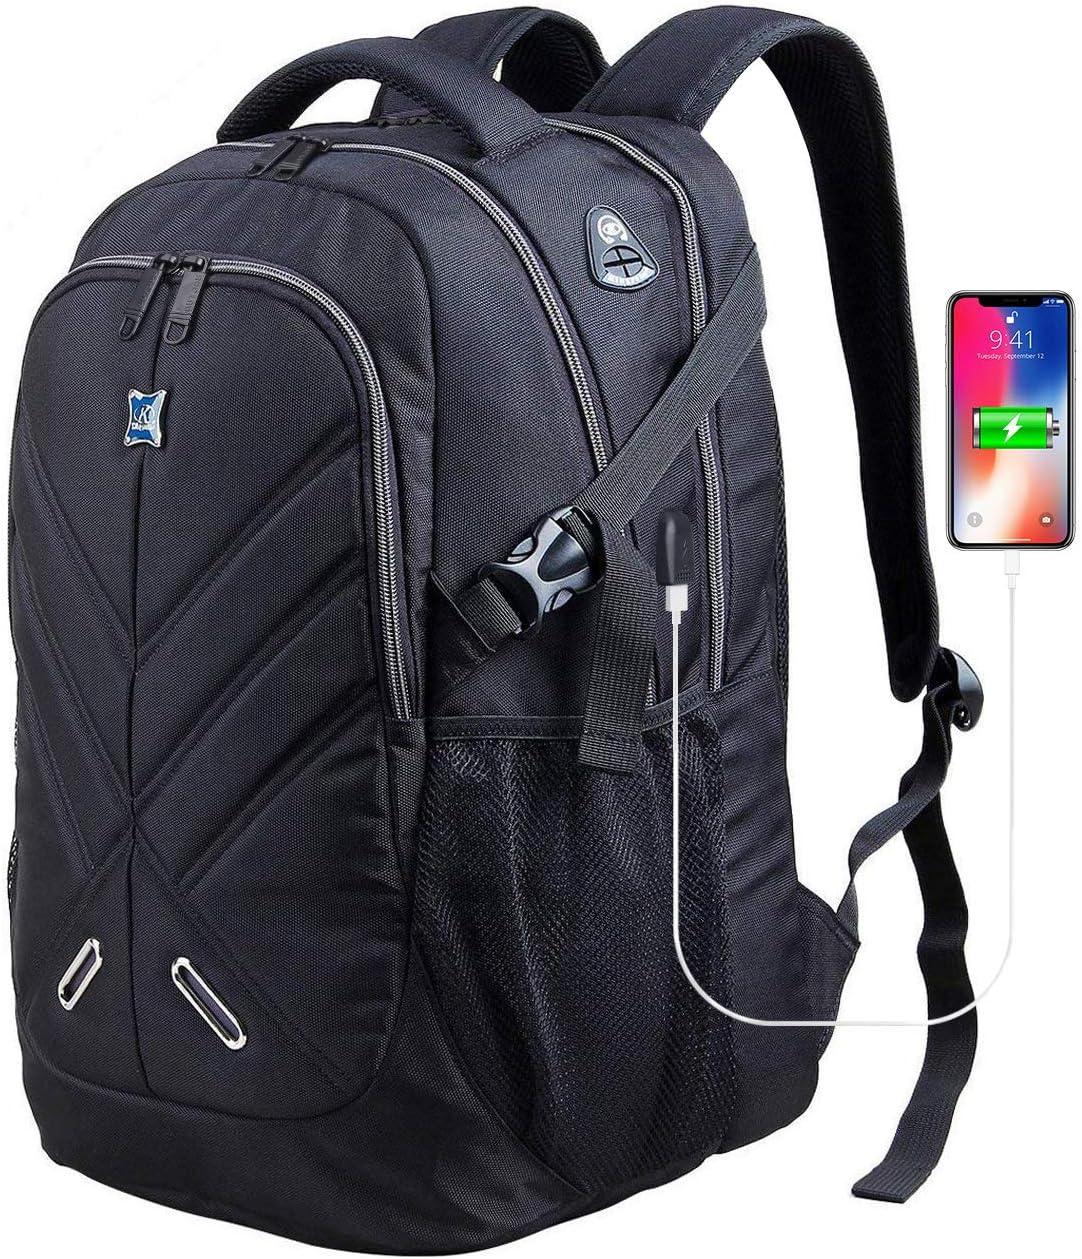 waterproof backpack for college